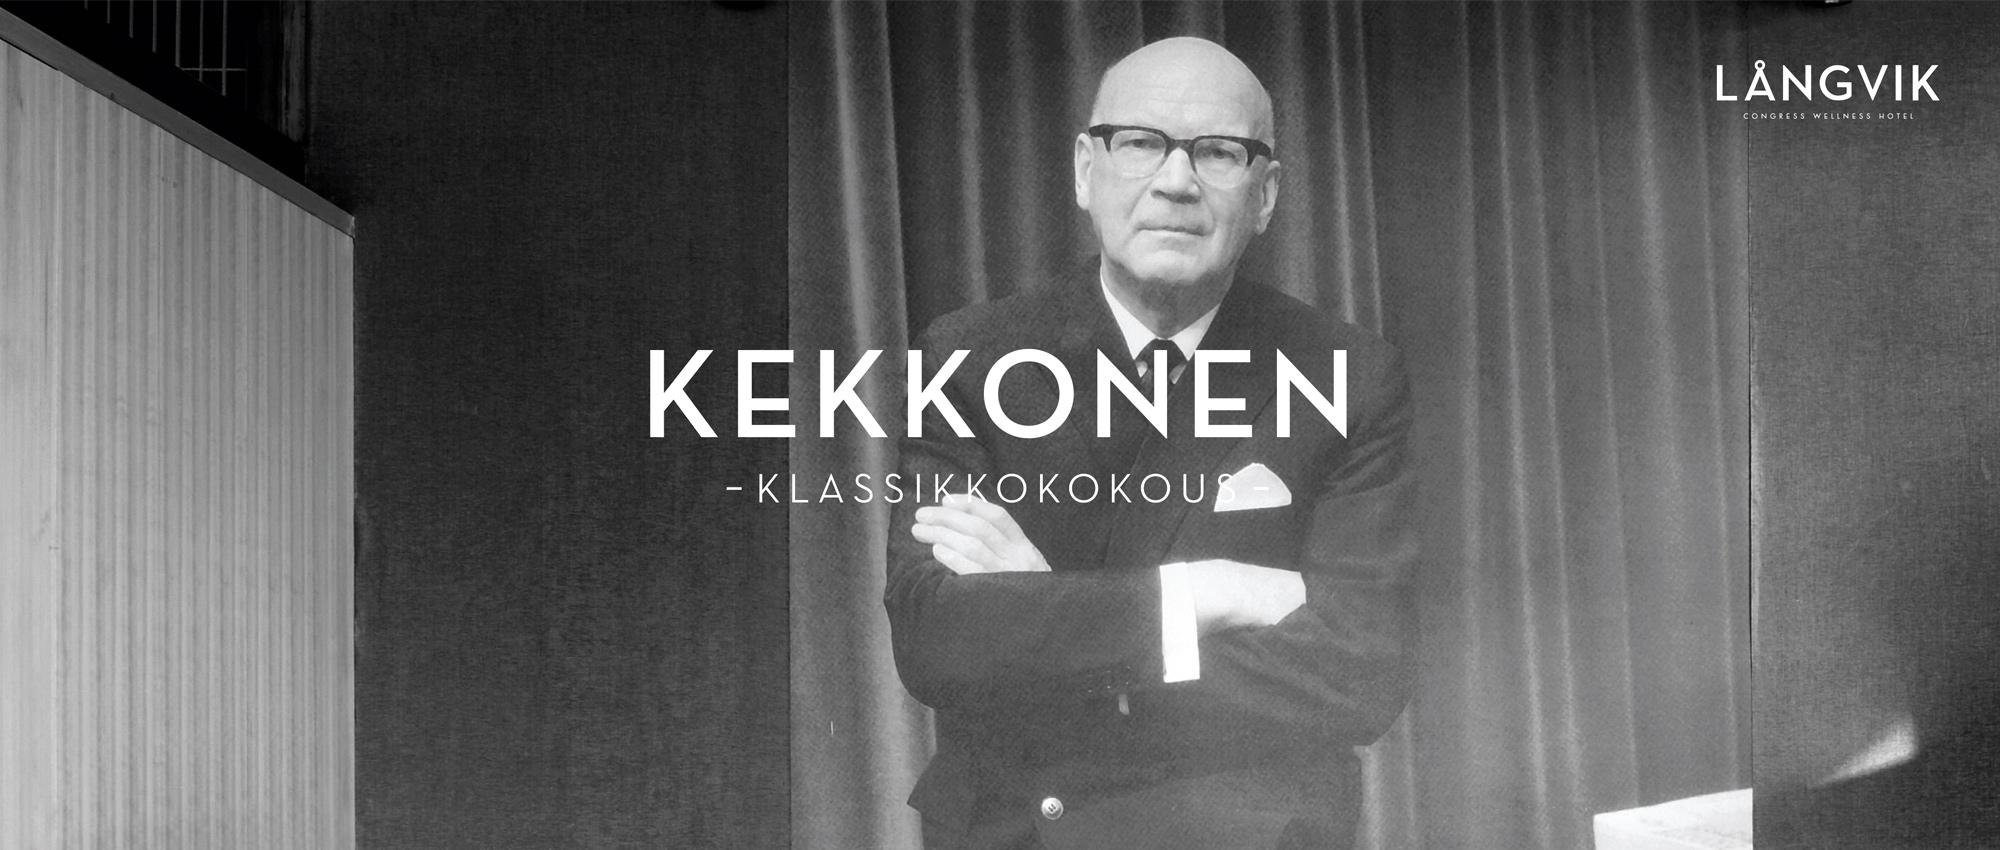 langvik_kekkonen